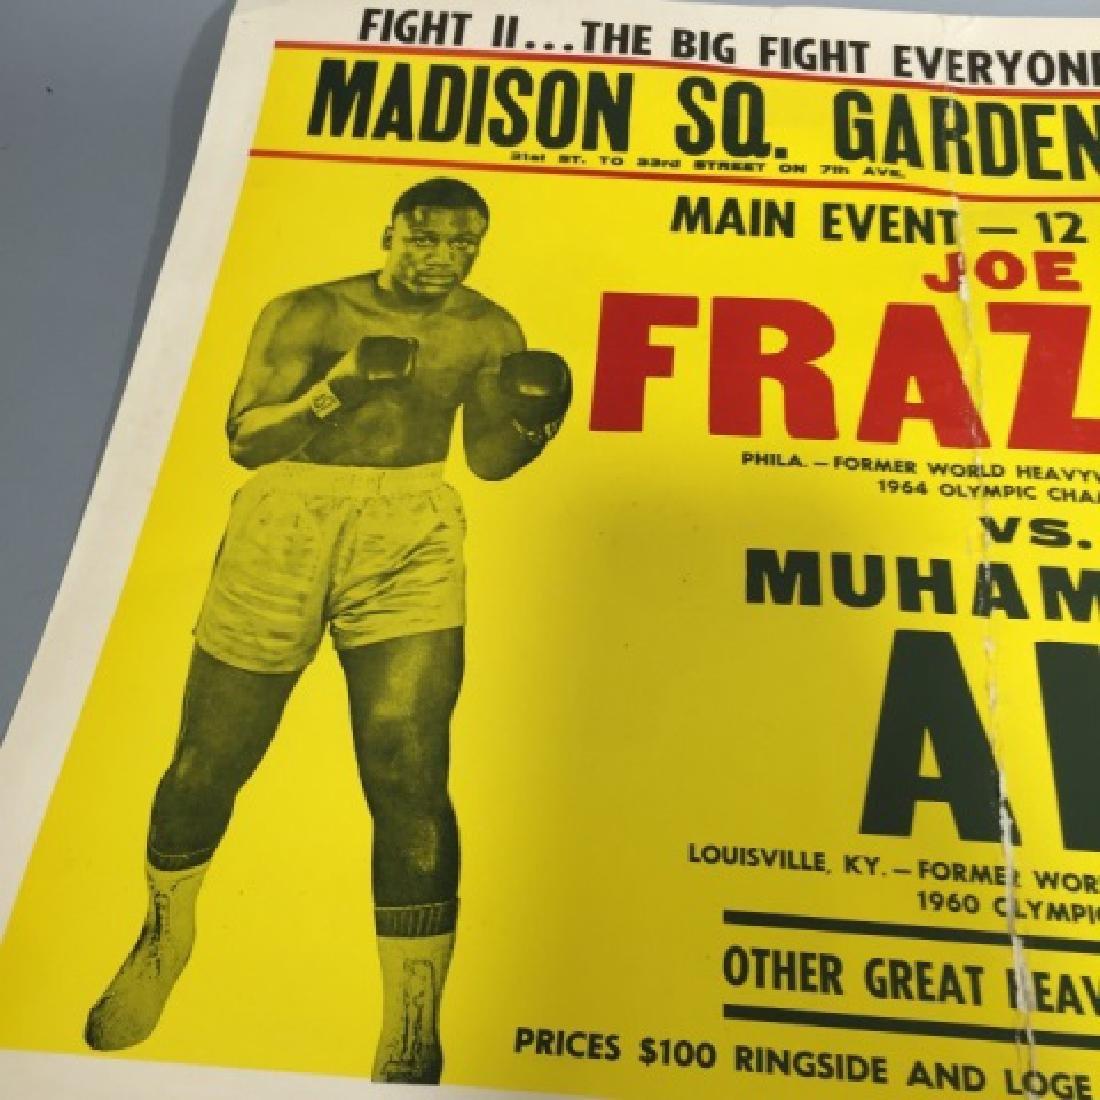 Original Frazier Ali MSG Fight Poster Jan 28, 1974 - 3